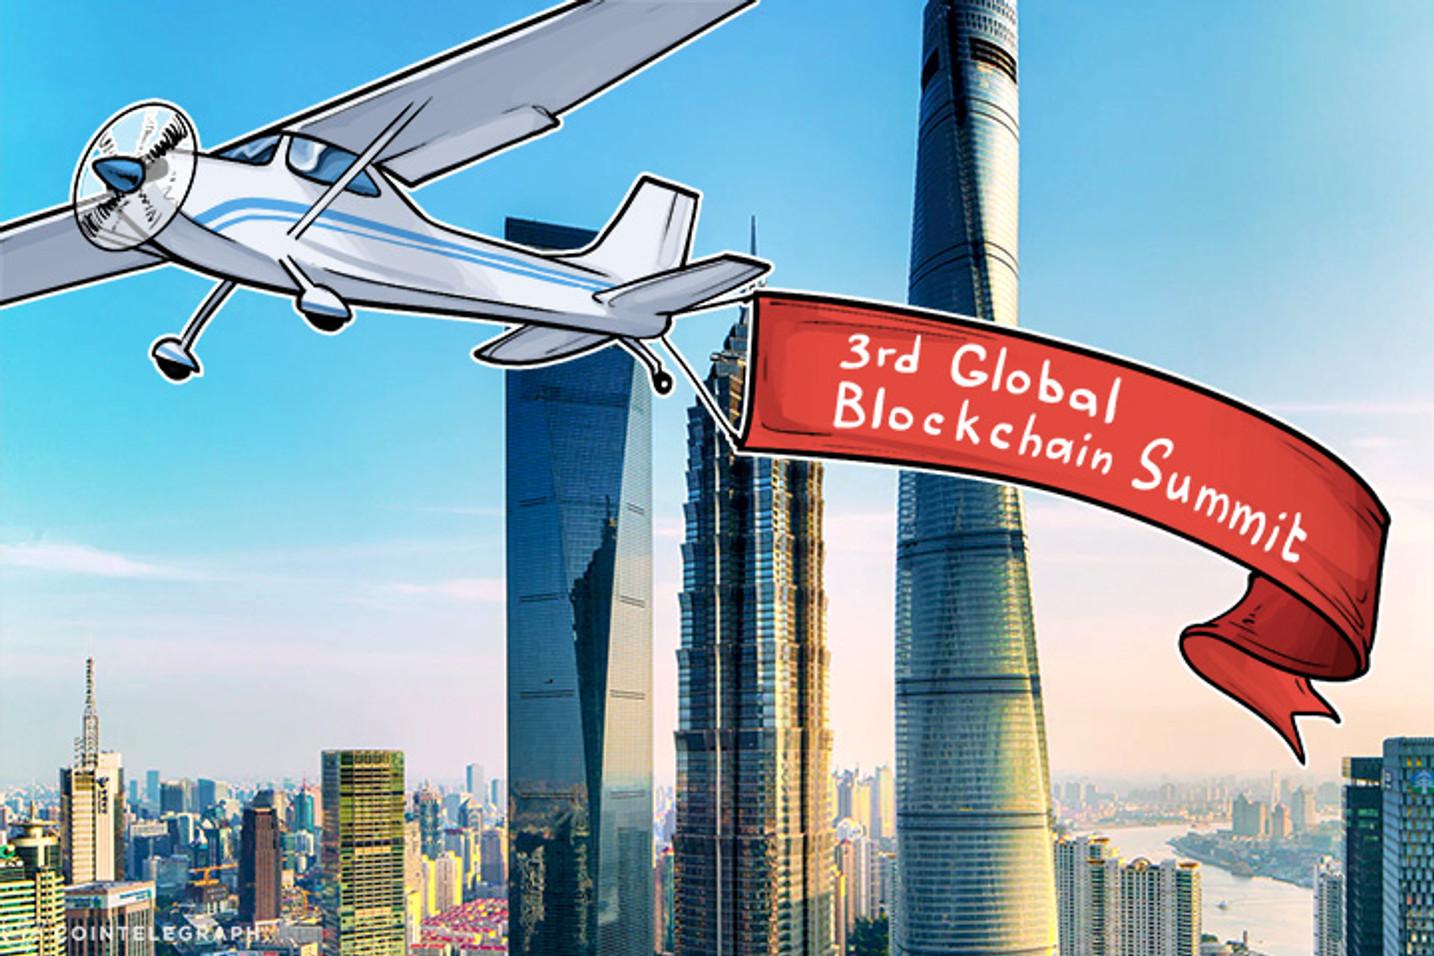 Vitalik Buterin, Nick Szabo Among Guests at Global Blockchain Summit Shanghai